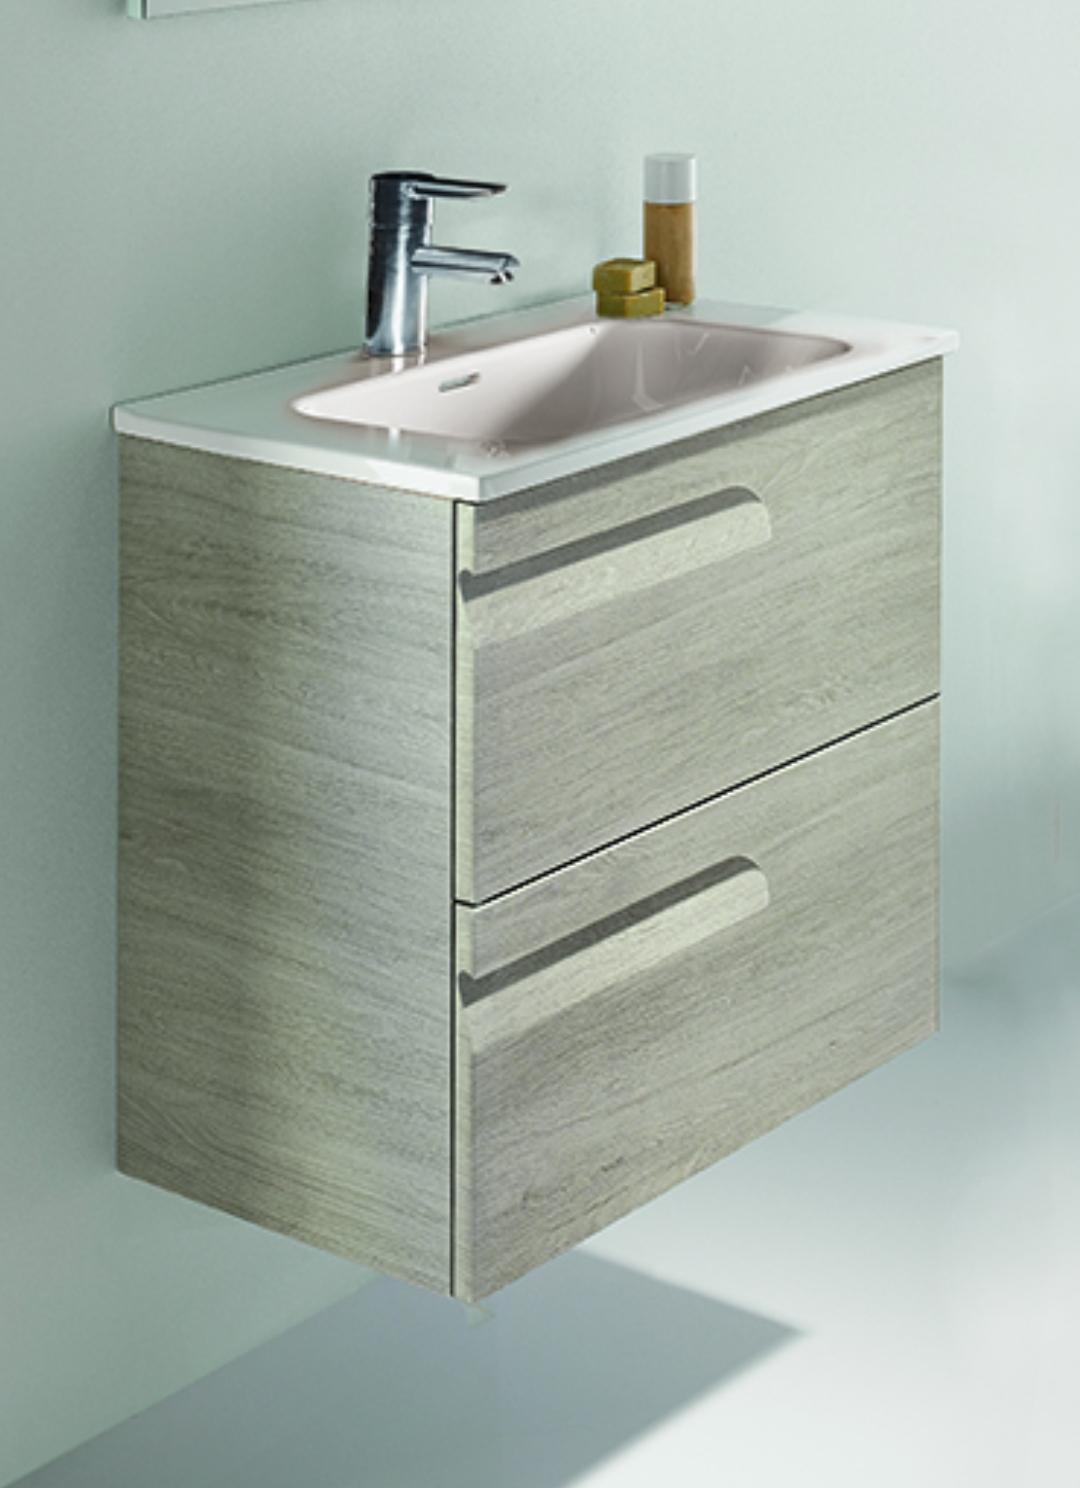 Mueble y lavabo Vitale 2 cajones de Royo Group